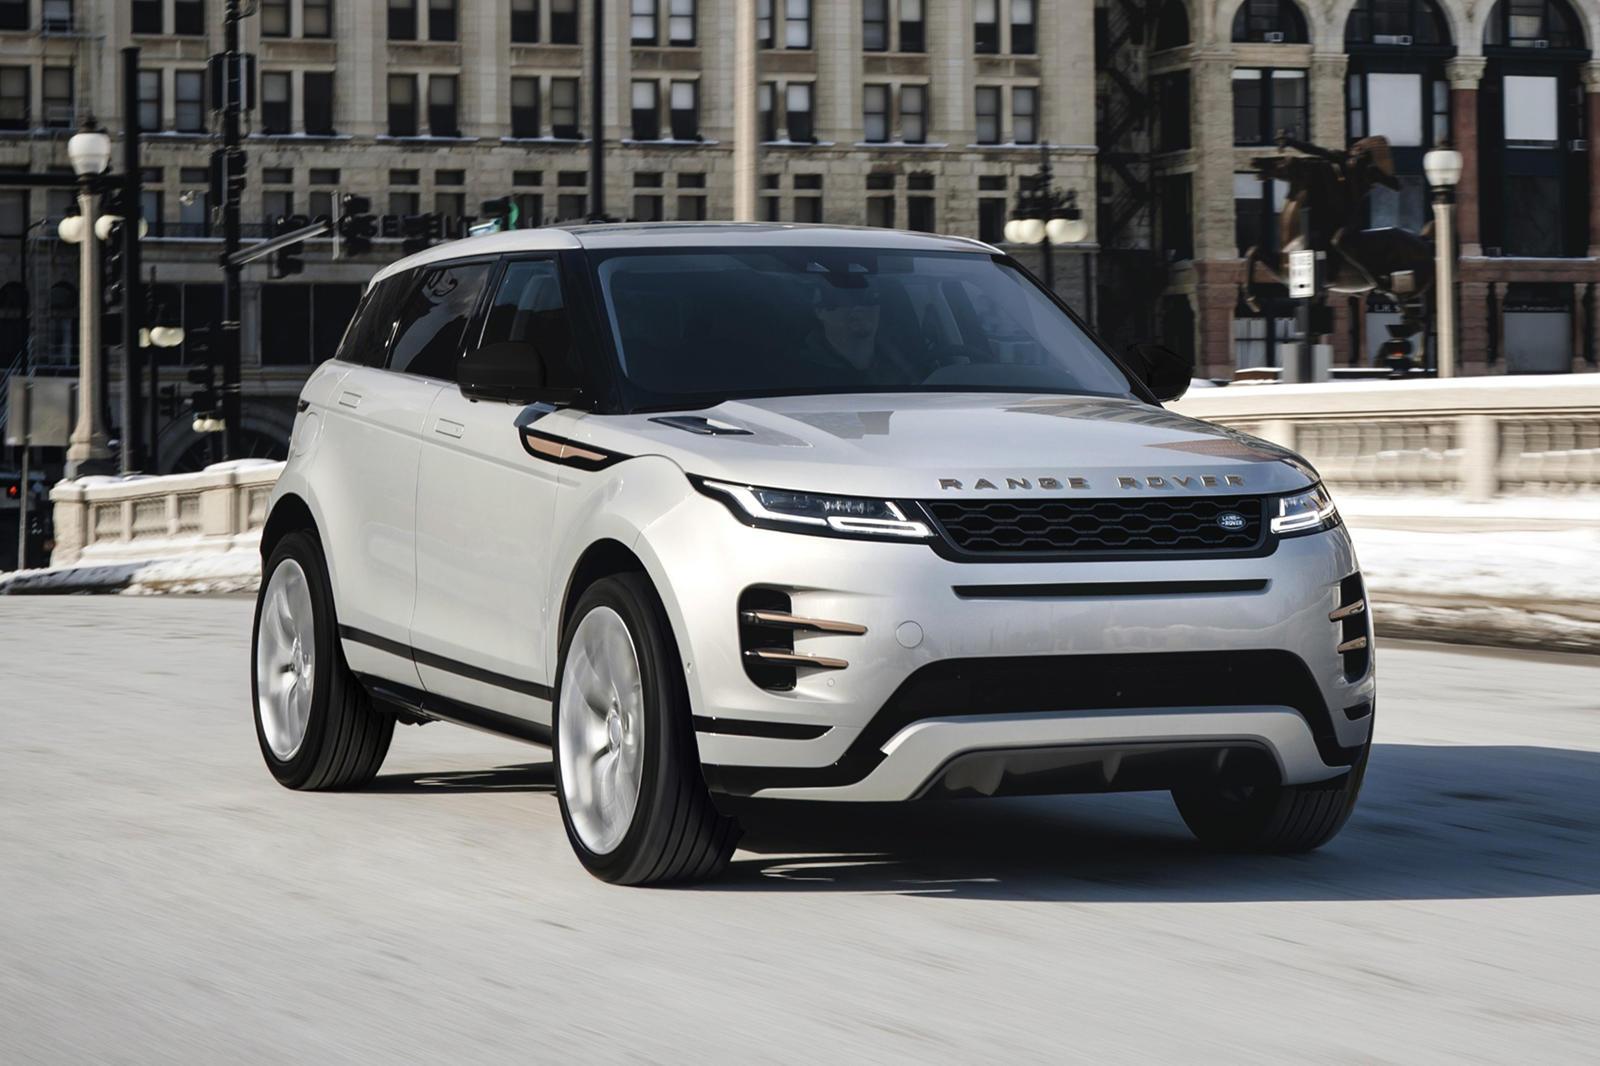 Meet The Flagship 2021 Range Rover Evoque Autobiography ...